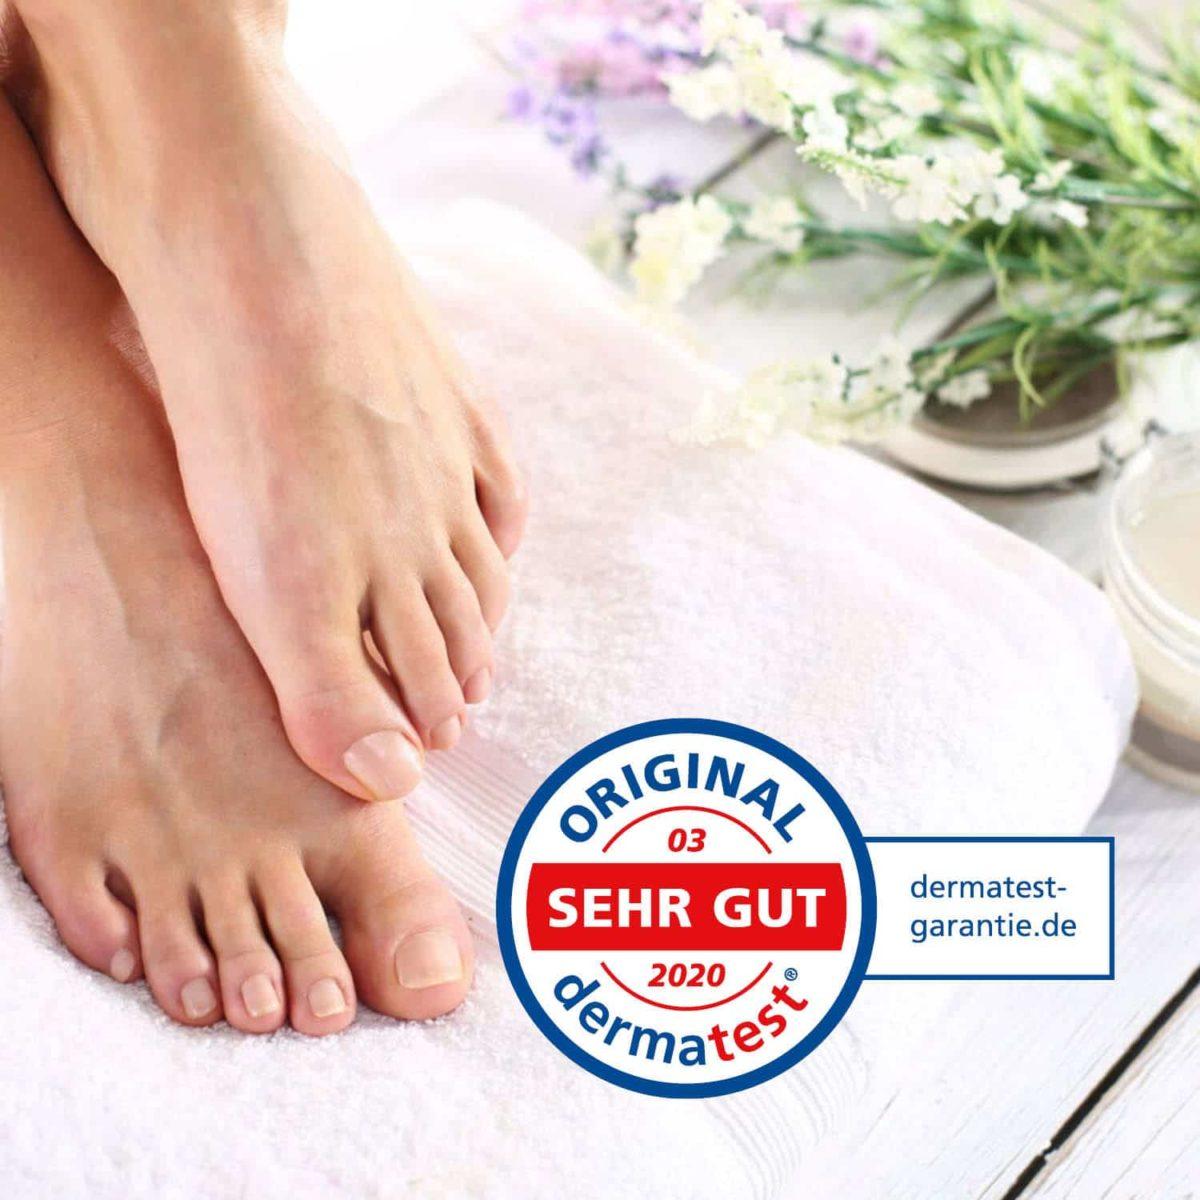 Casida Product Combo Nail Oil and Foot Bath Salt Bundle PZN 10022445 12907018 Nagelpilz bekämpfen pflanzlich Fußpilz8